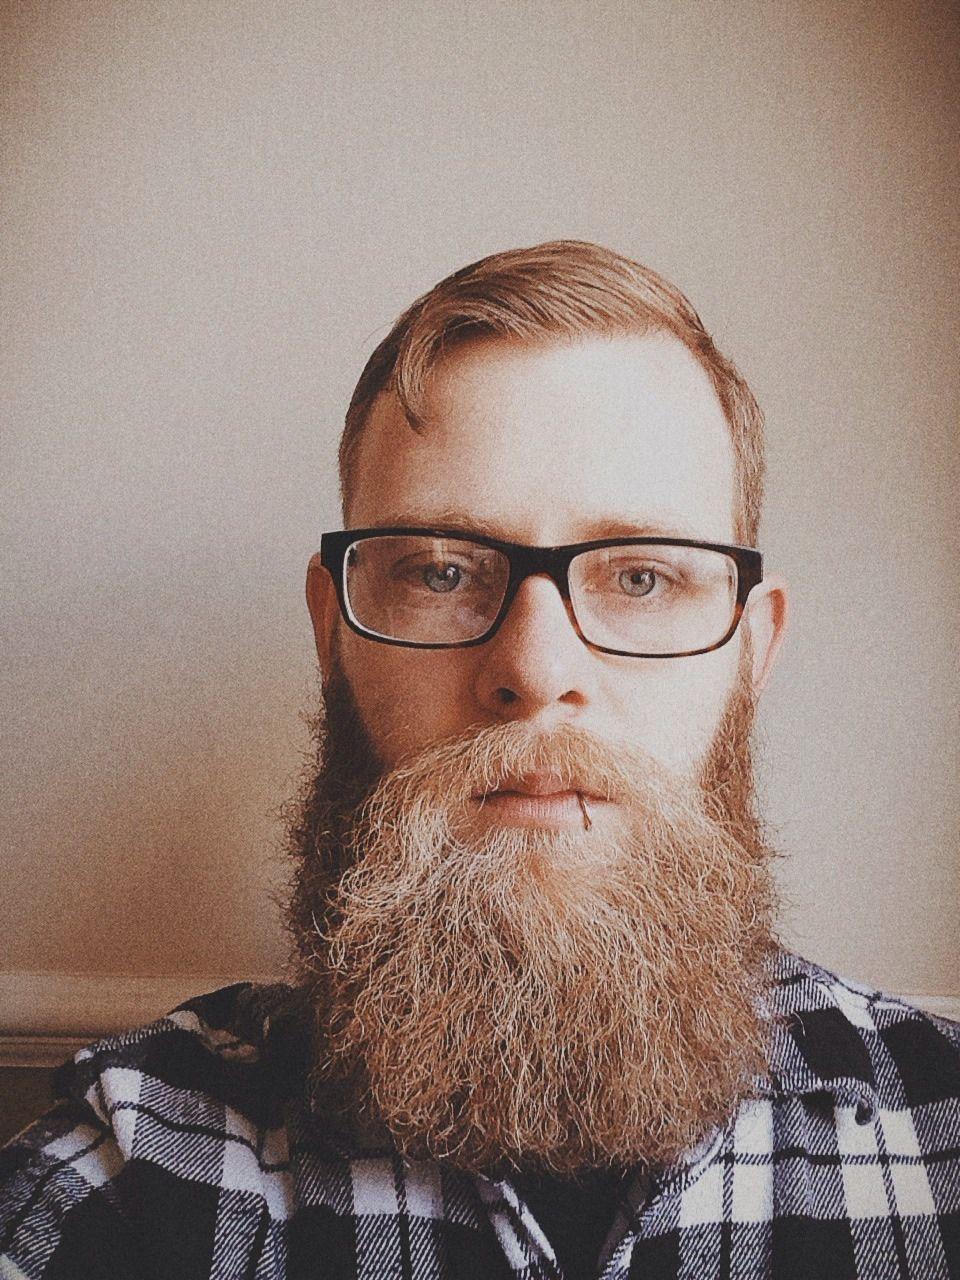 b86fa716c85 indyphotographs  Selfie Beard No Mustache